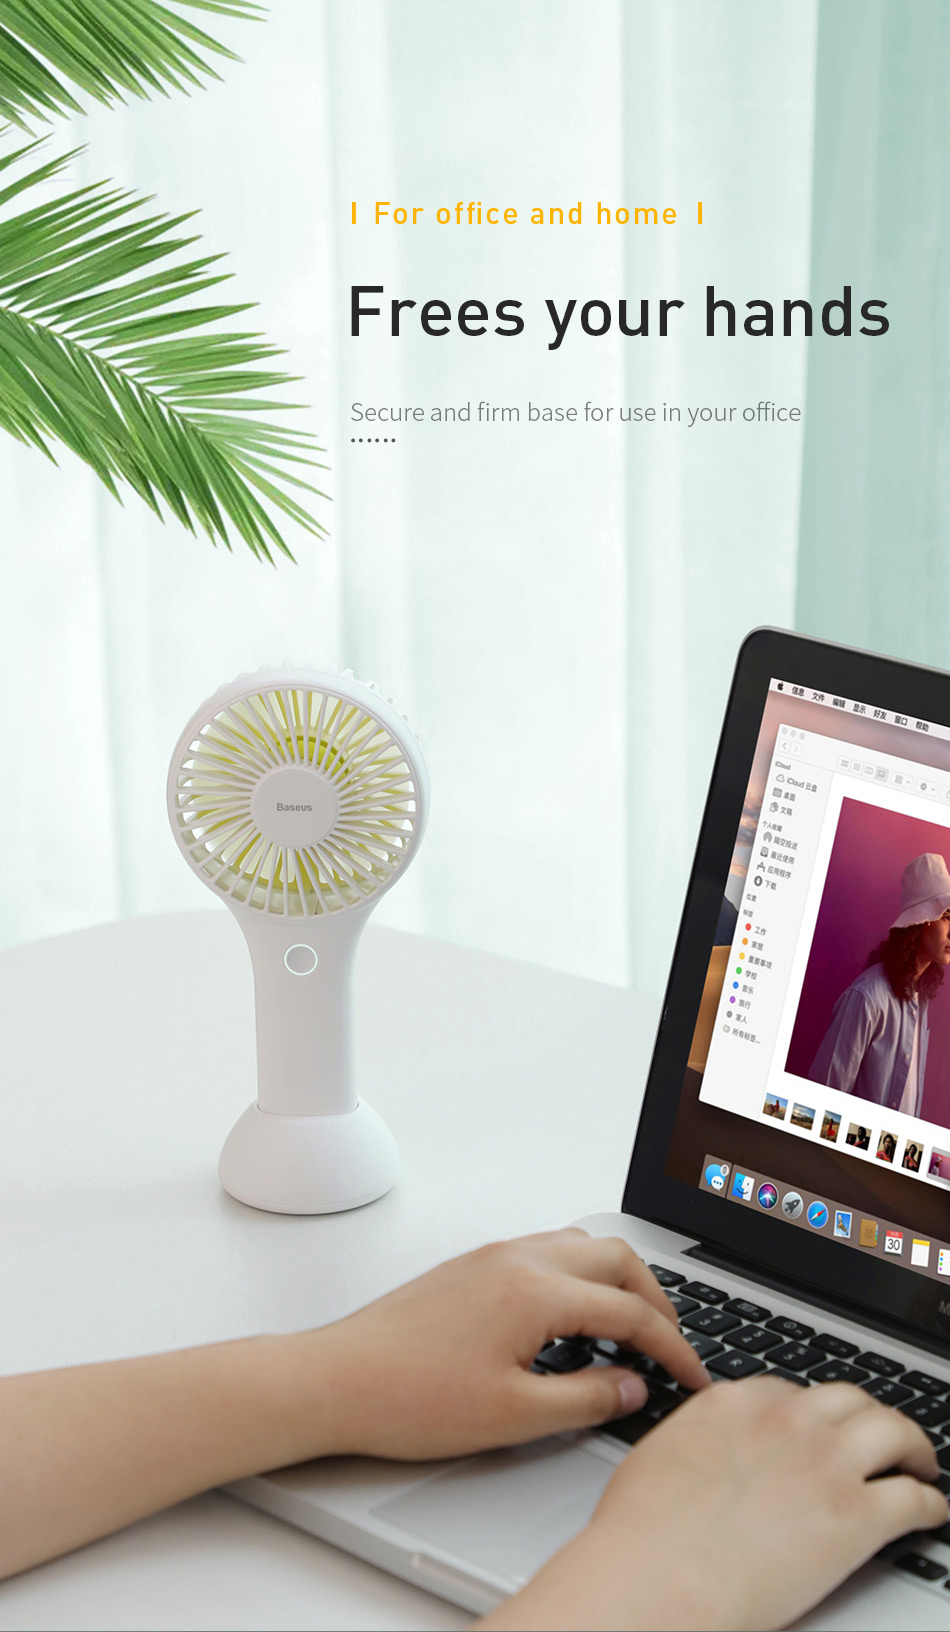 Baseus Mini USB Fan Portable Handheld with Built-in Battery 1800mAH